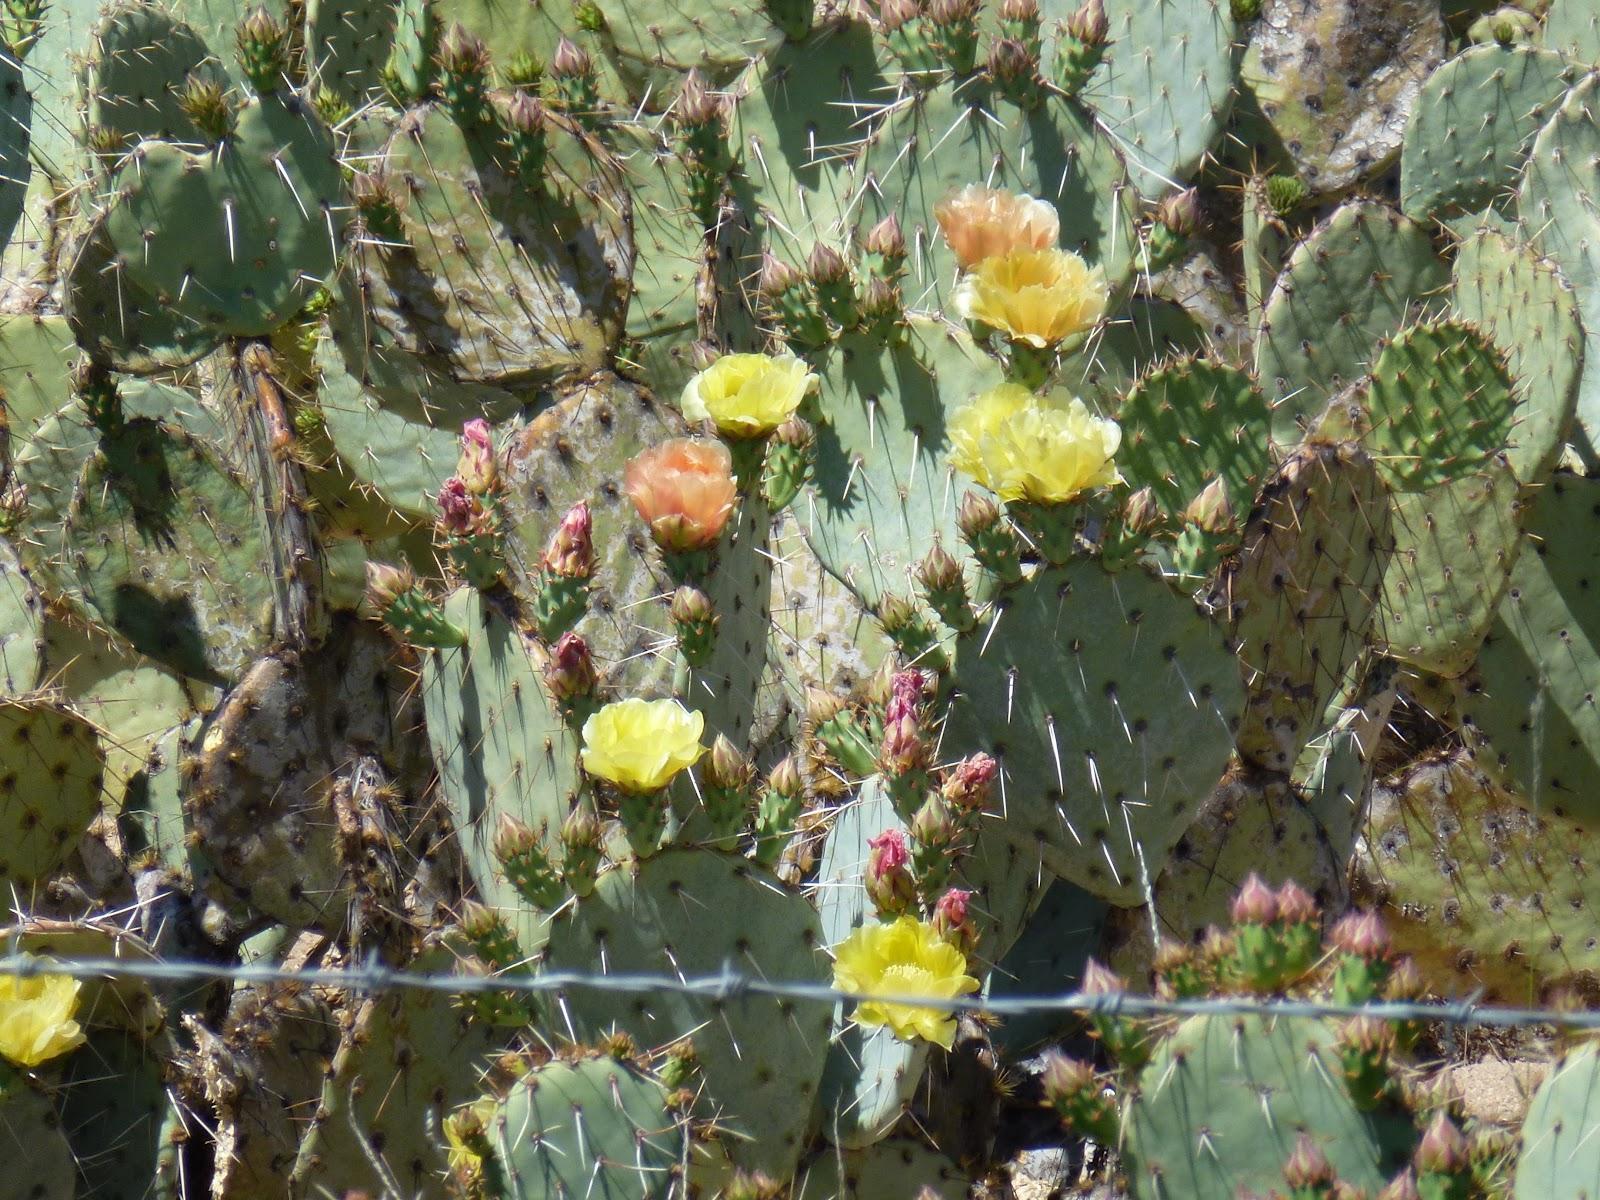 6 Reasons to Be Amazed by Arizona's Saguaro Cactus |Saguaro Cactus Flowers